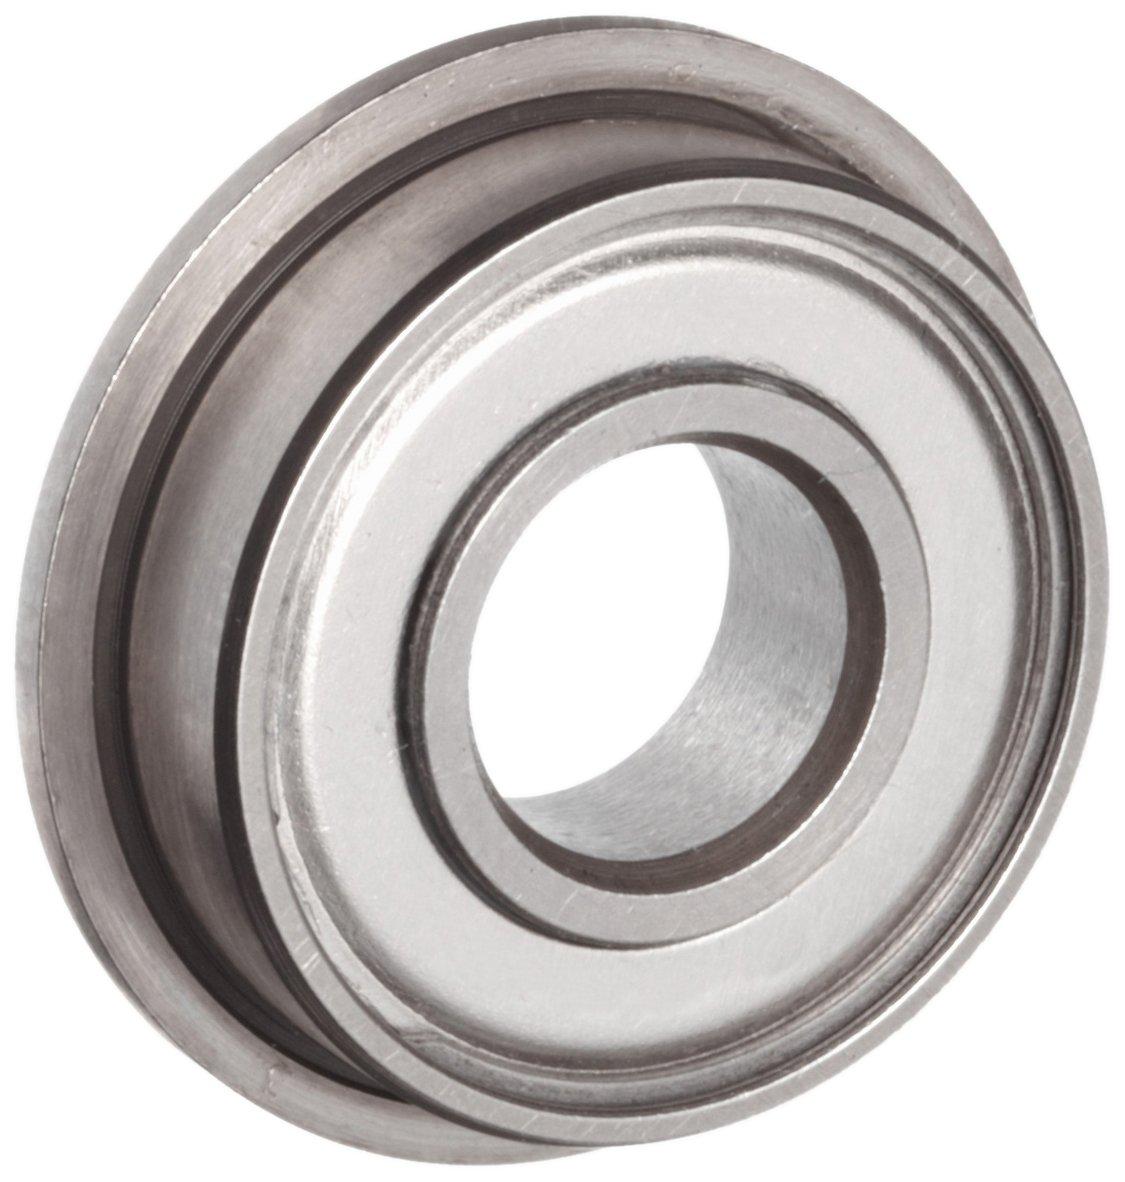 Metric Metal FLANGE Ball Bearing 15*28*7 F6902z 10pcs F6902zz 15x28x7mm